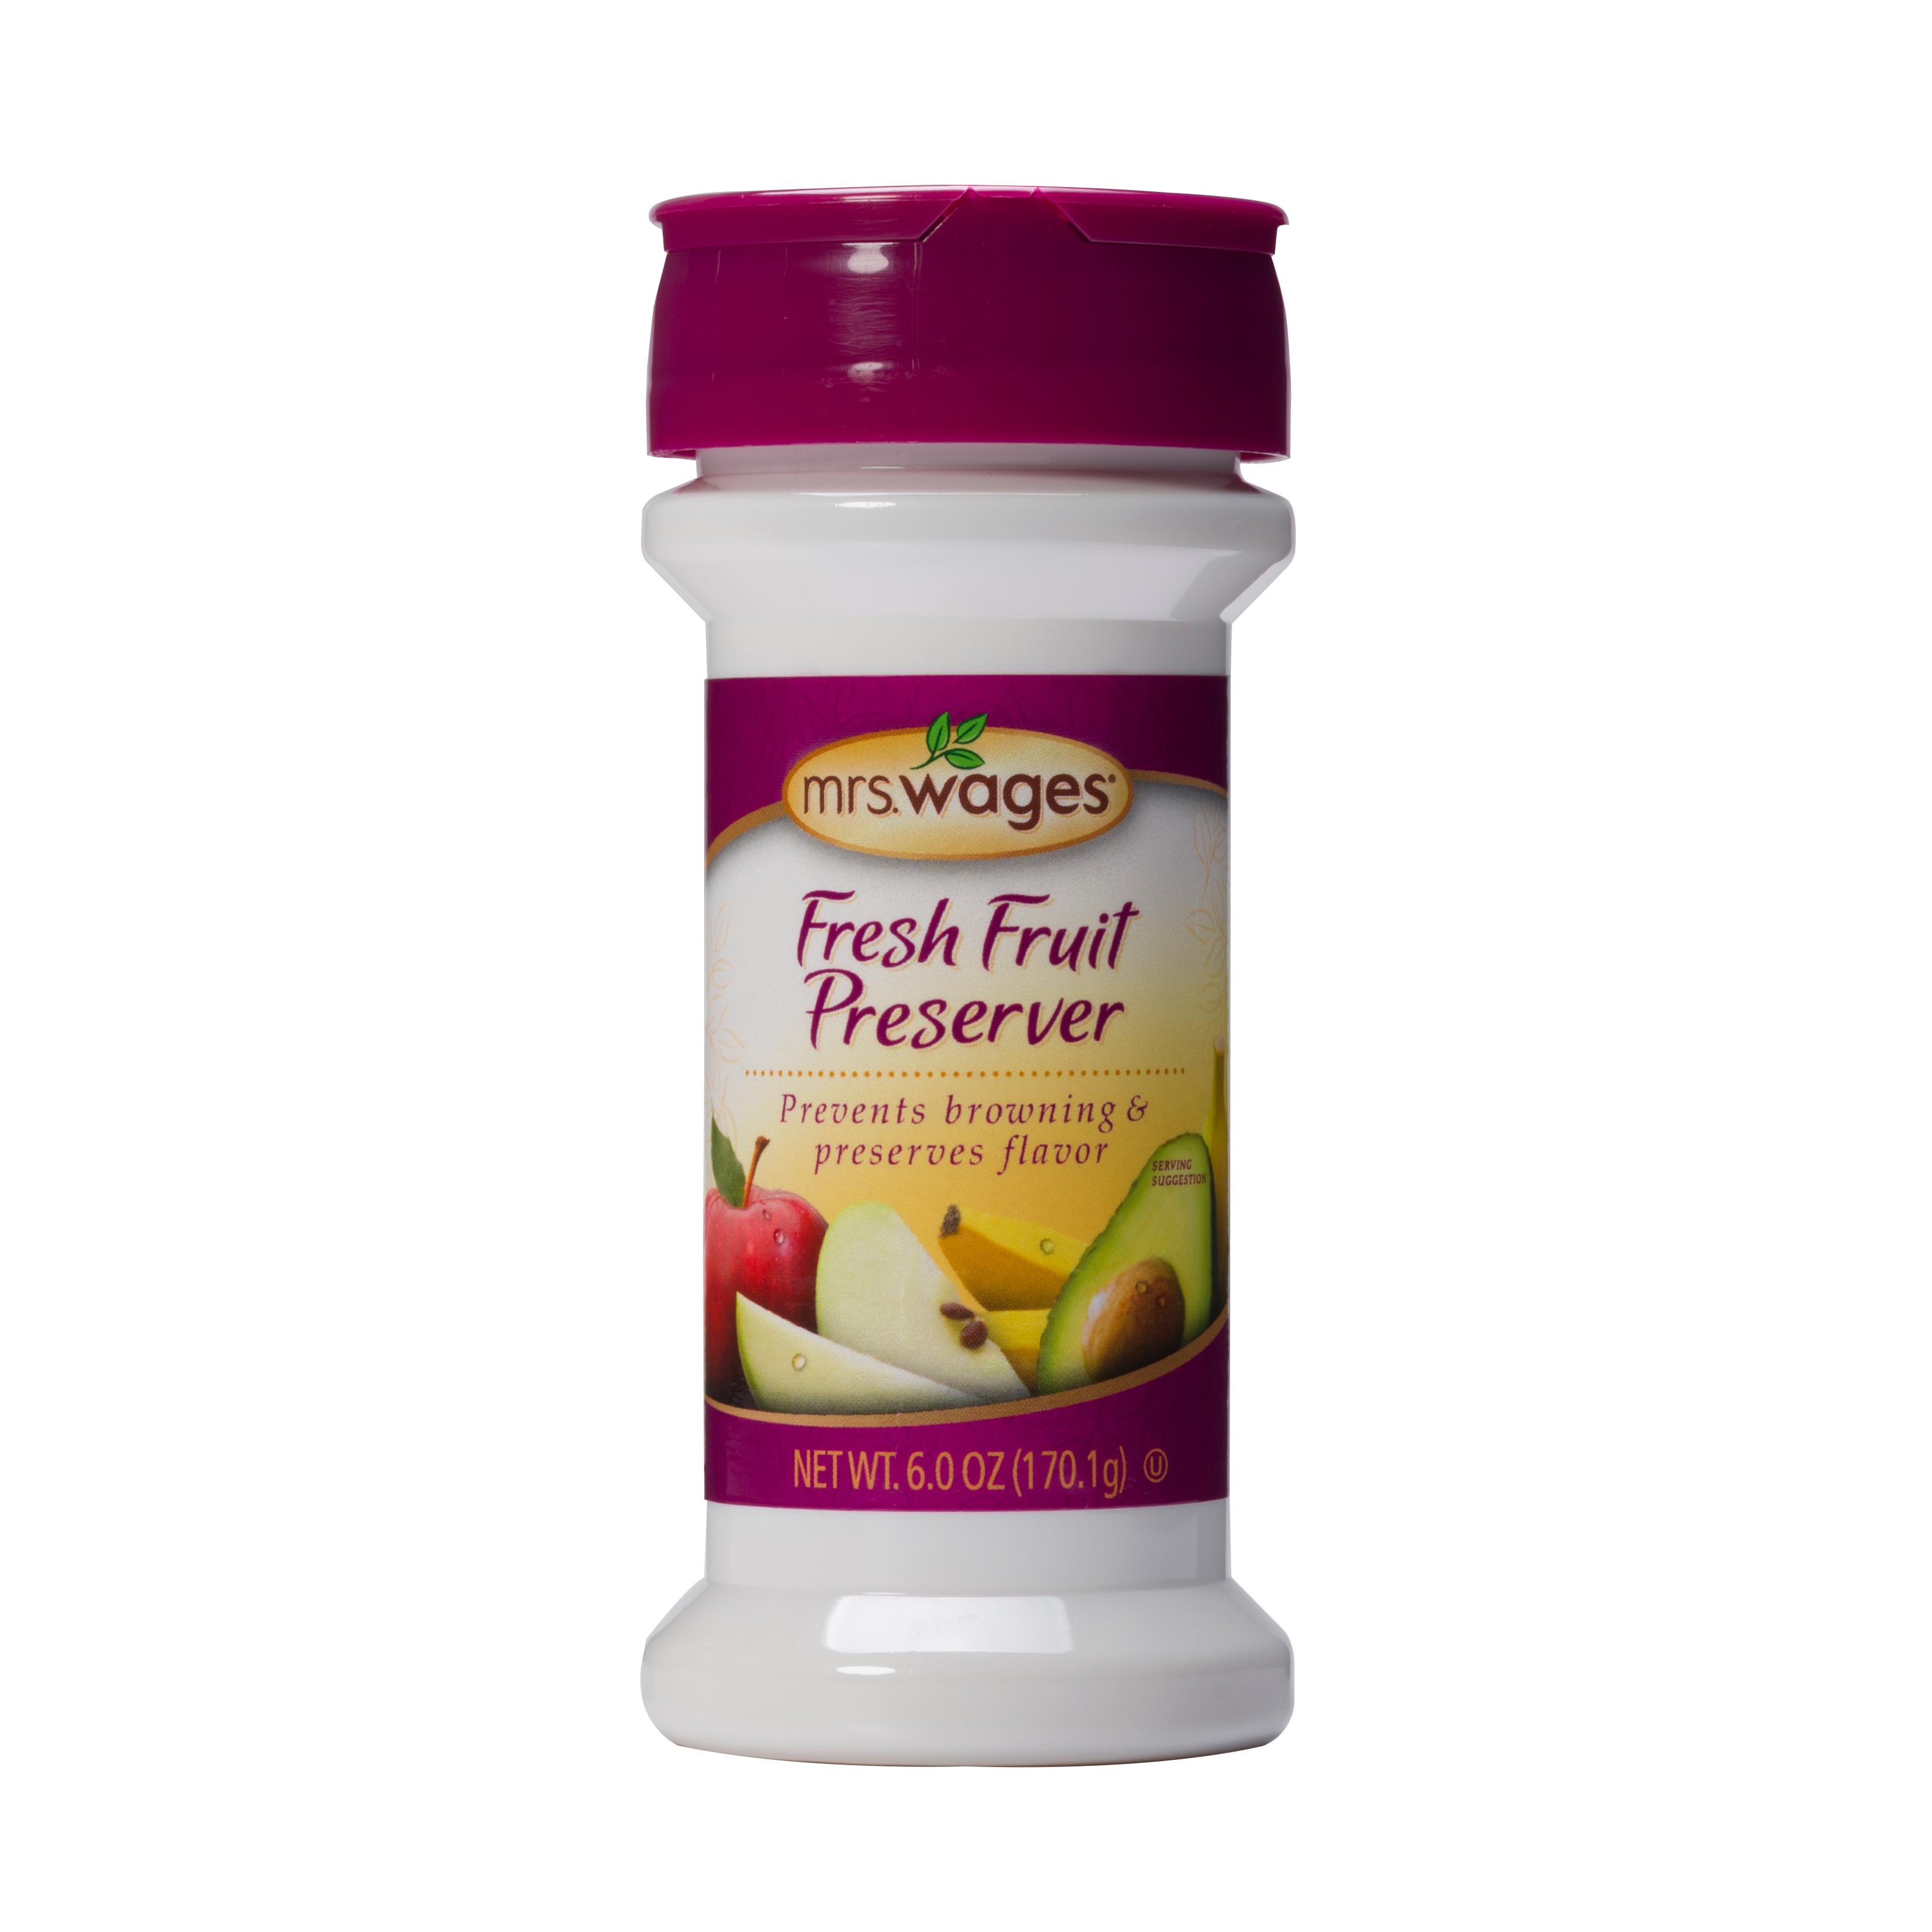 Mrs. Wages Fresh Fruit Preserver